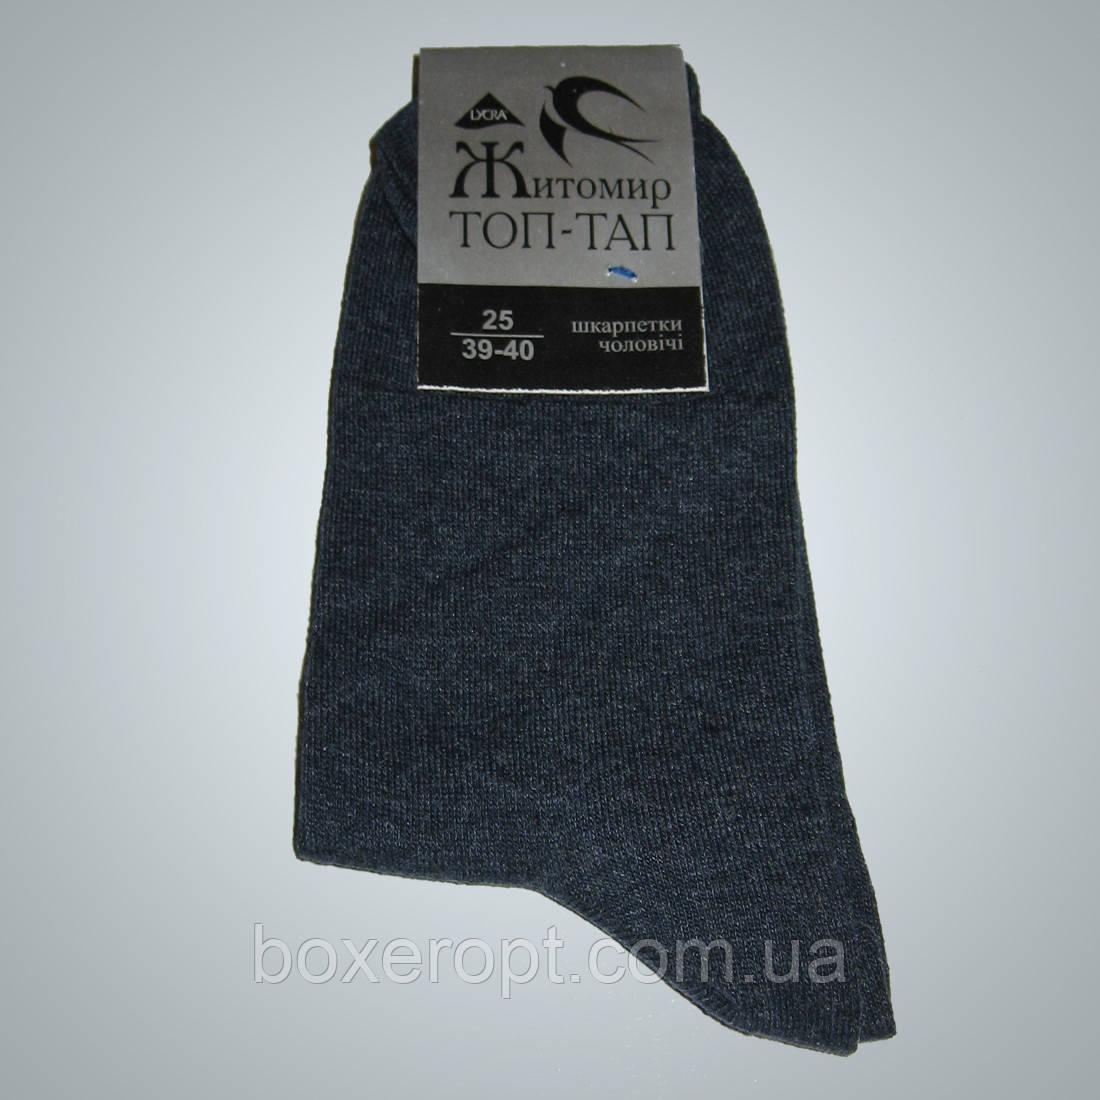 Мужские носки ТОП-ТАП - 7.00 грн./пара (стрейч, джинс)